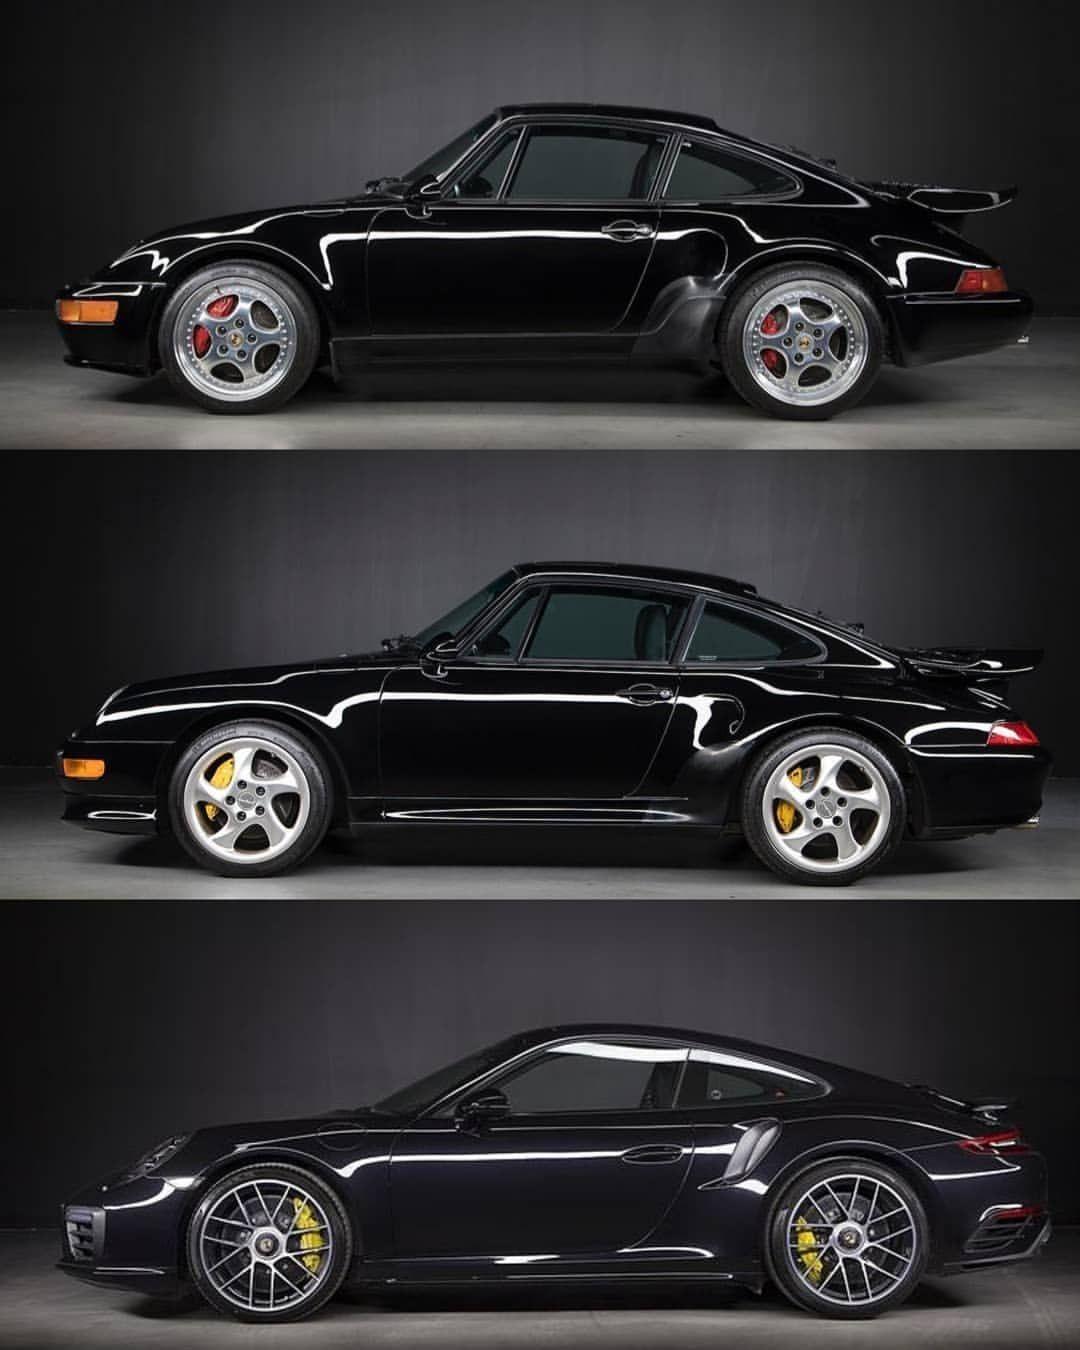 Choose Your Turbo S Weapon 964 Turbo S Flachbau Top 993 Turbo S Middle Or 991 Turbo S Bottom C Porsche Porsche Cars Porsche 911